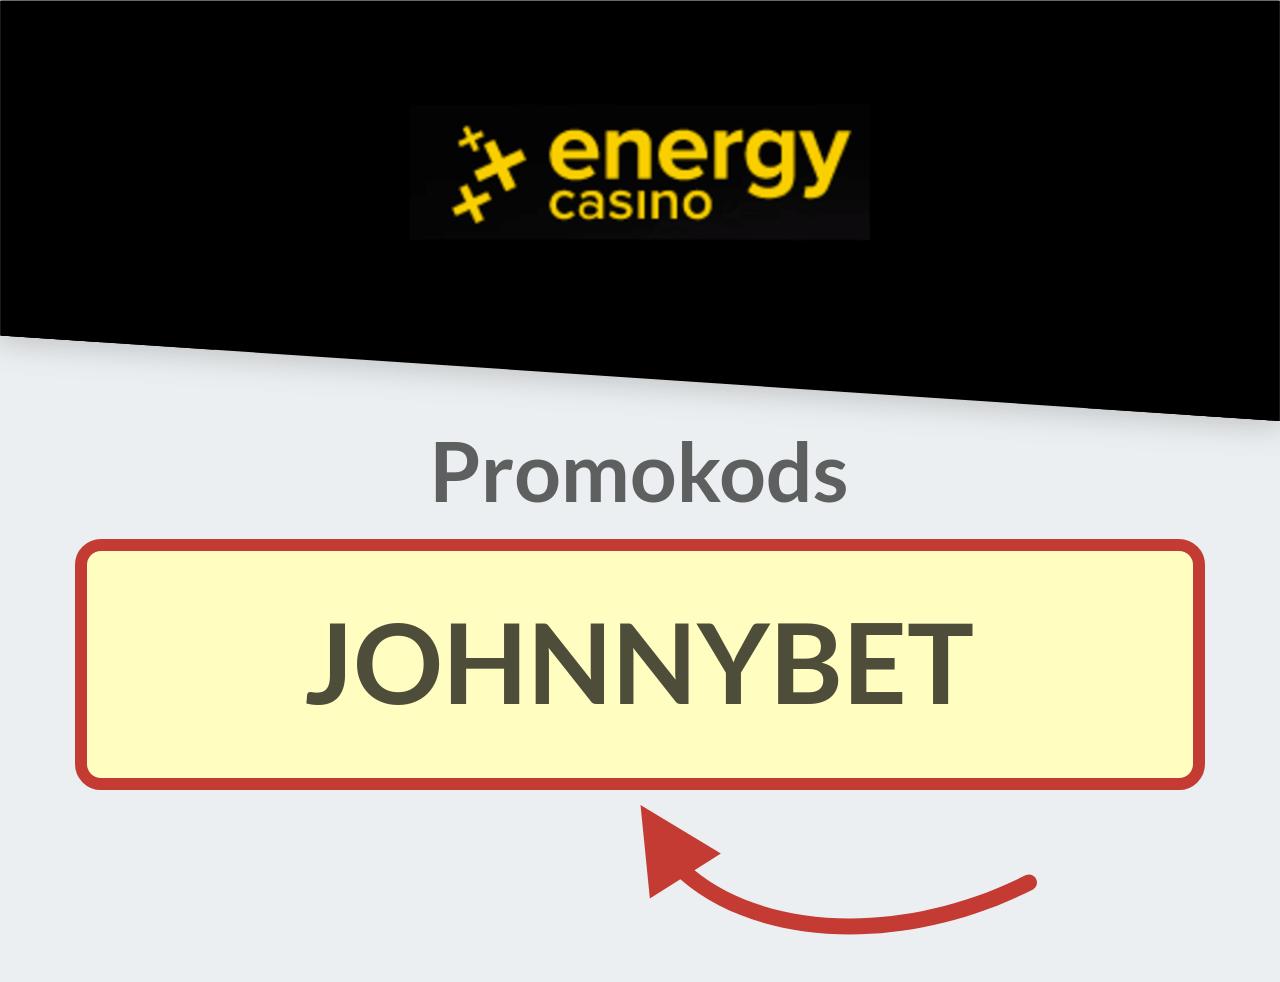 Energy Casino Promokods